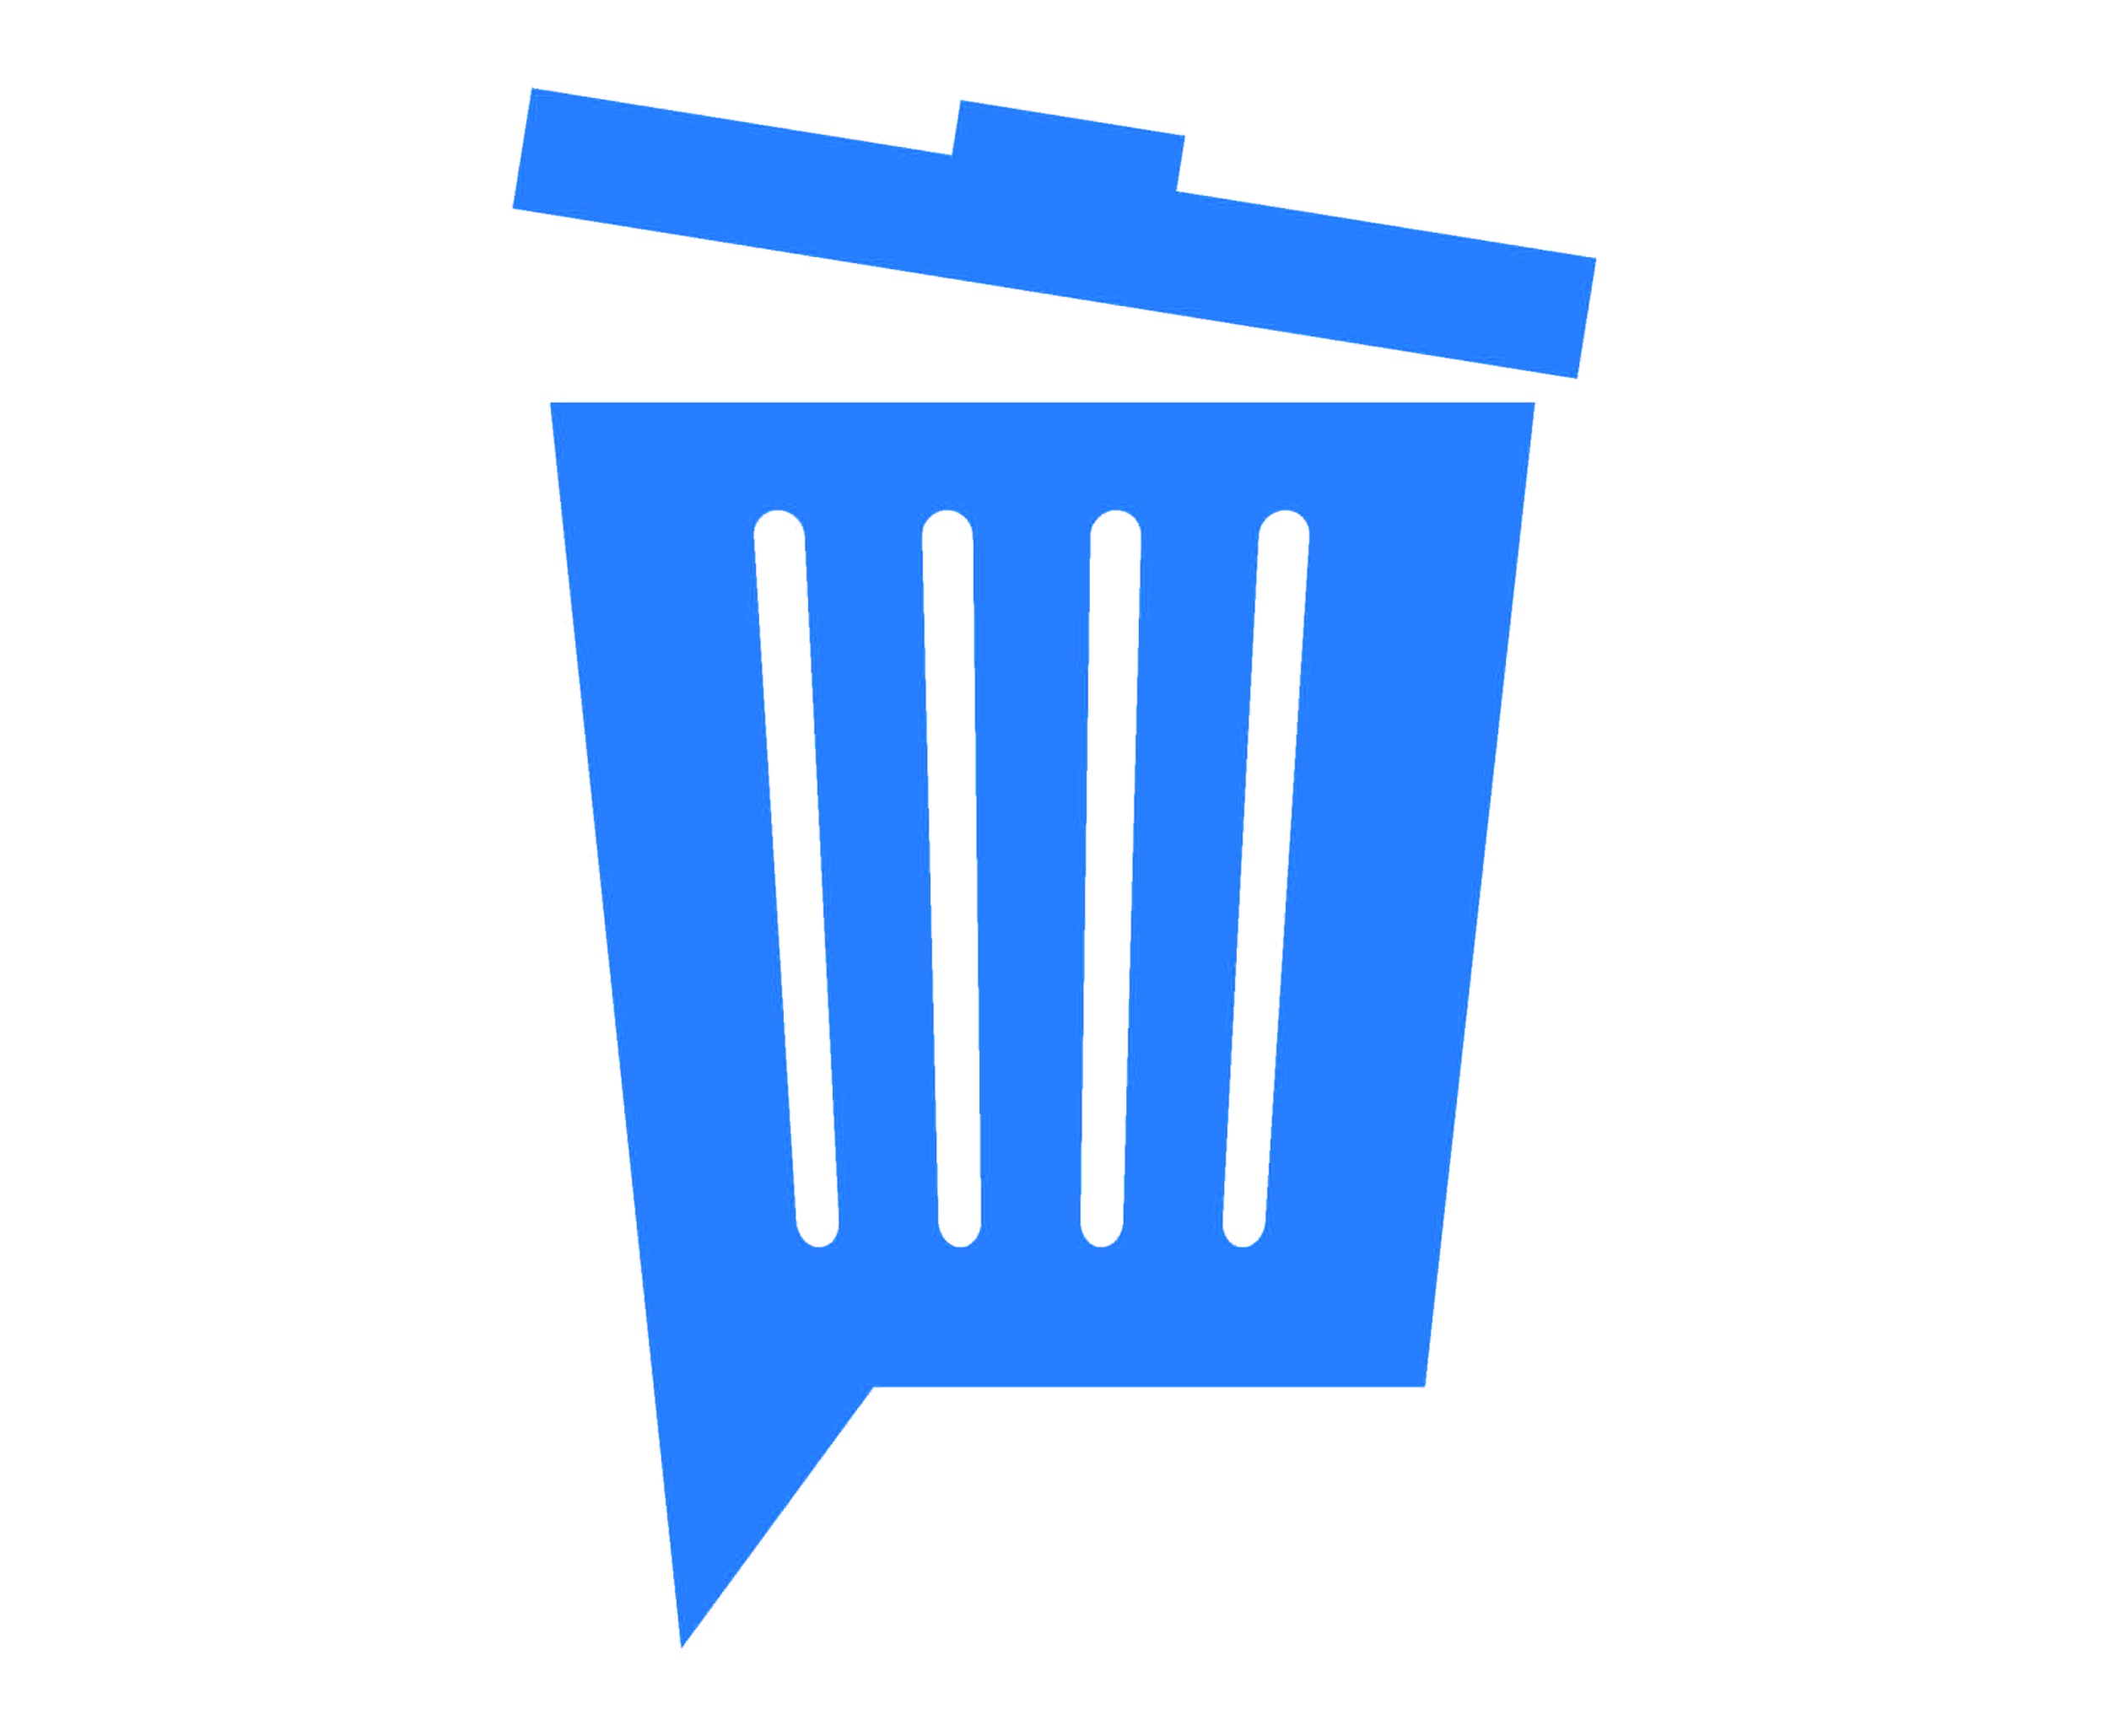 Bin.png